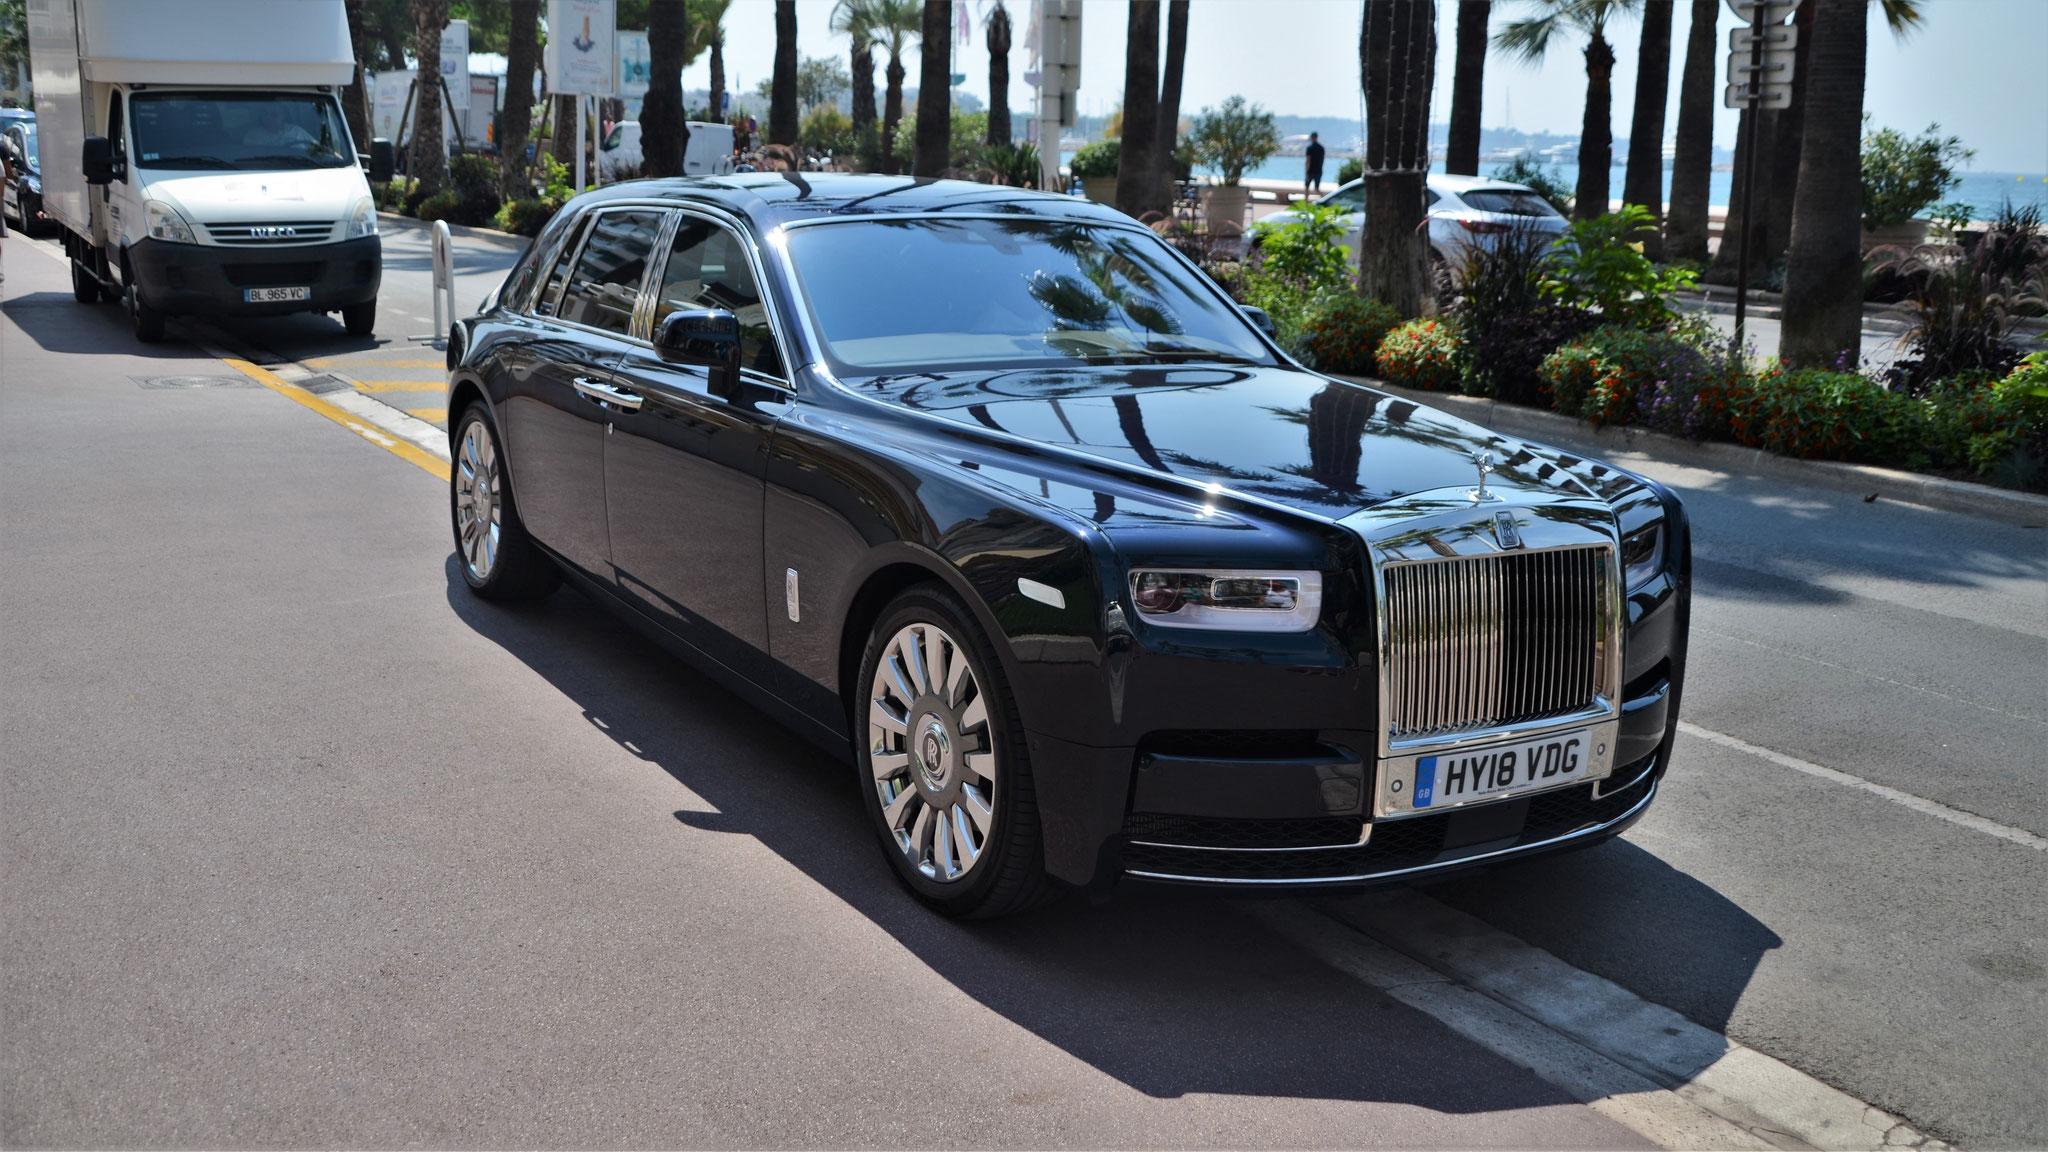 Rolls Royce Phantom - HY18-VDG (GB)